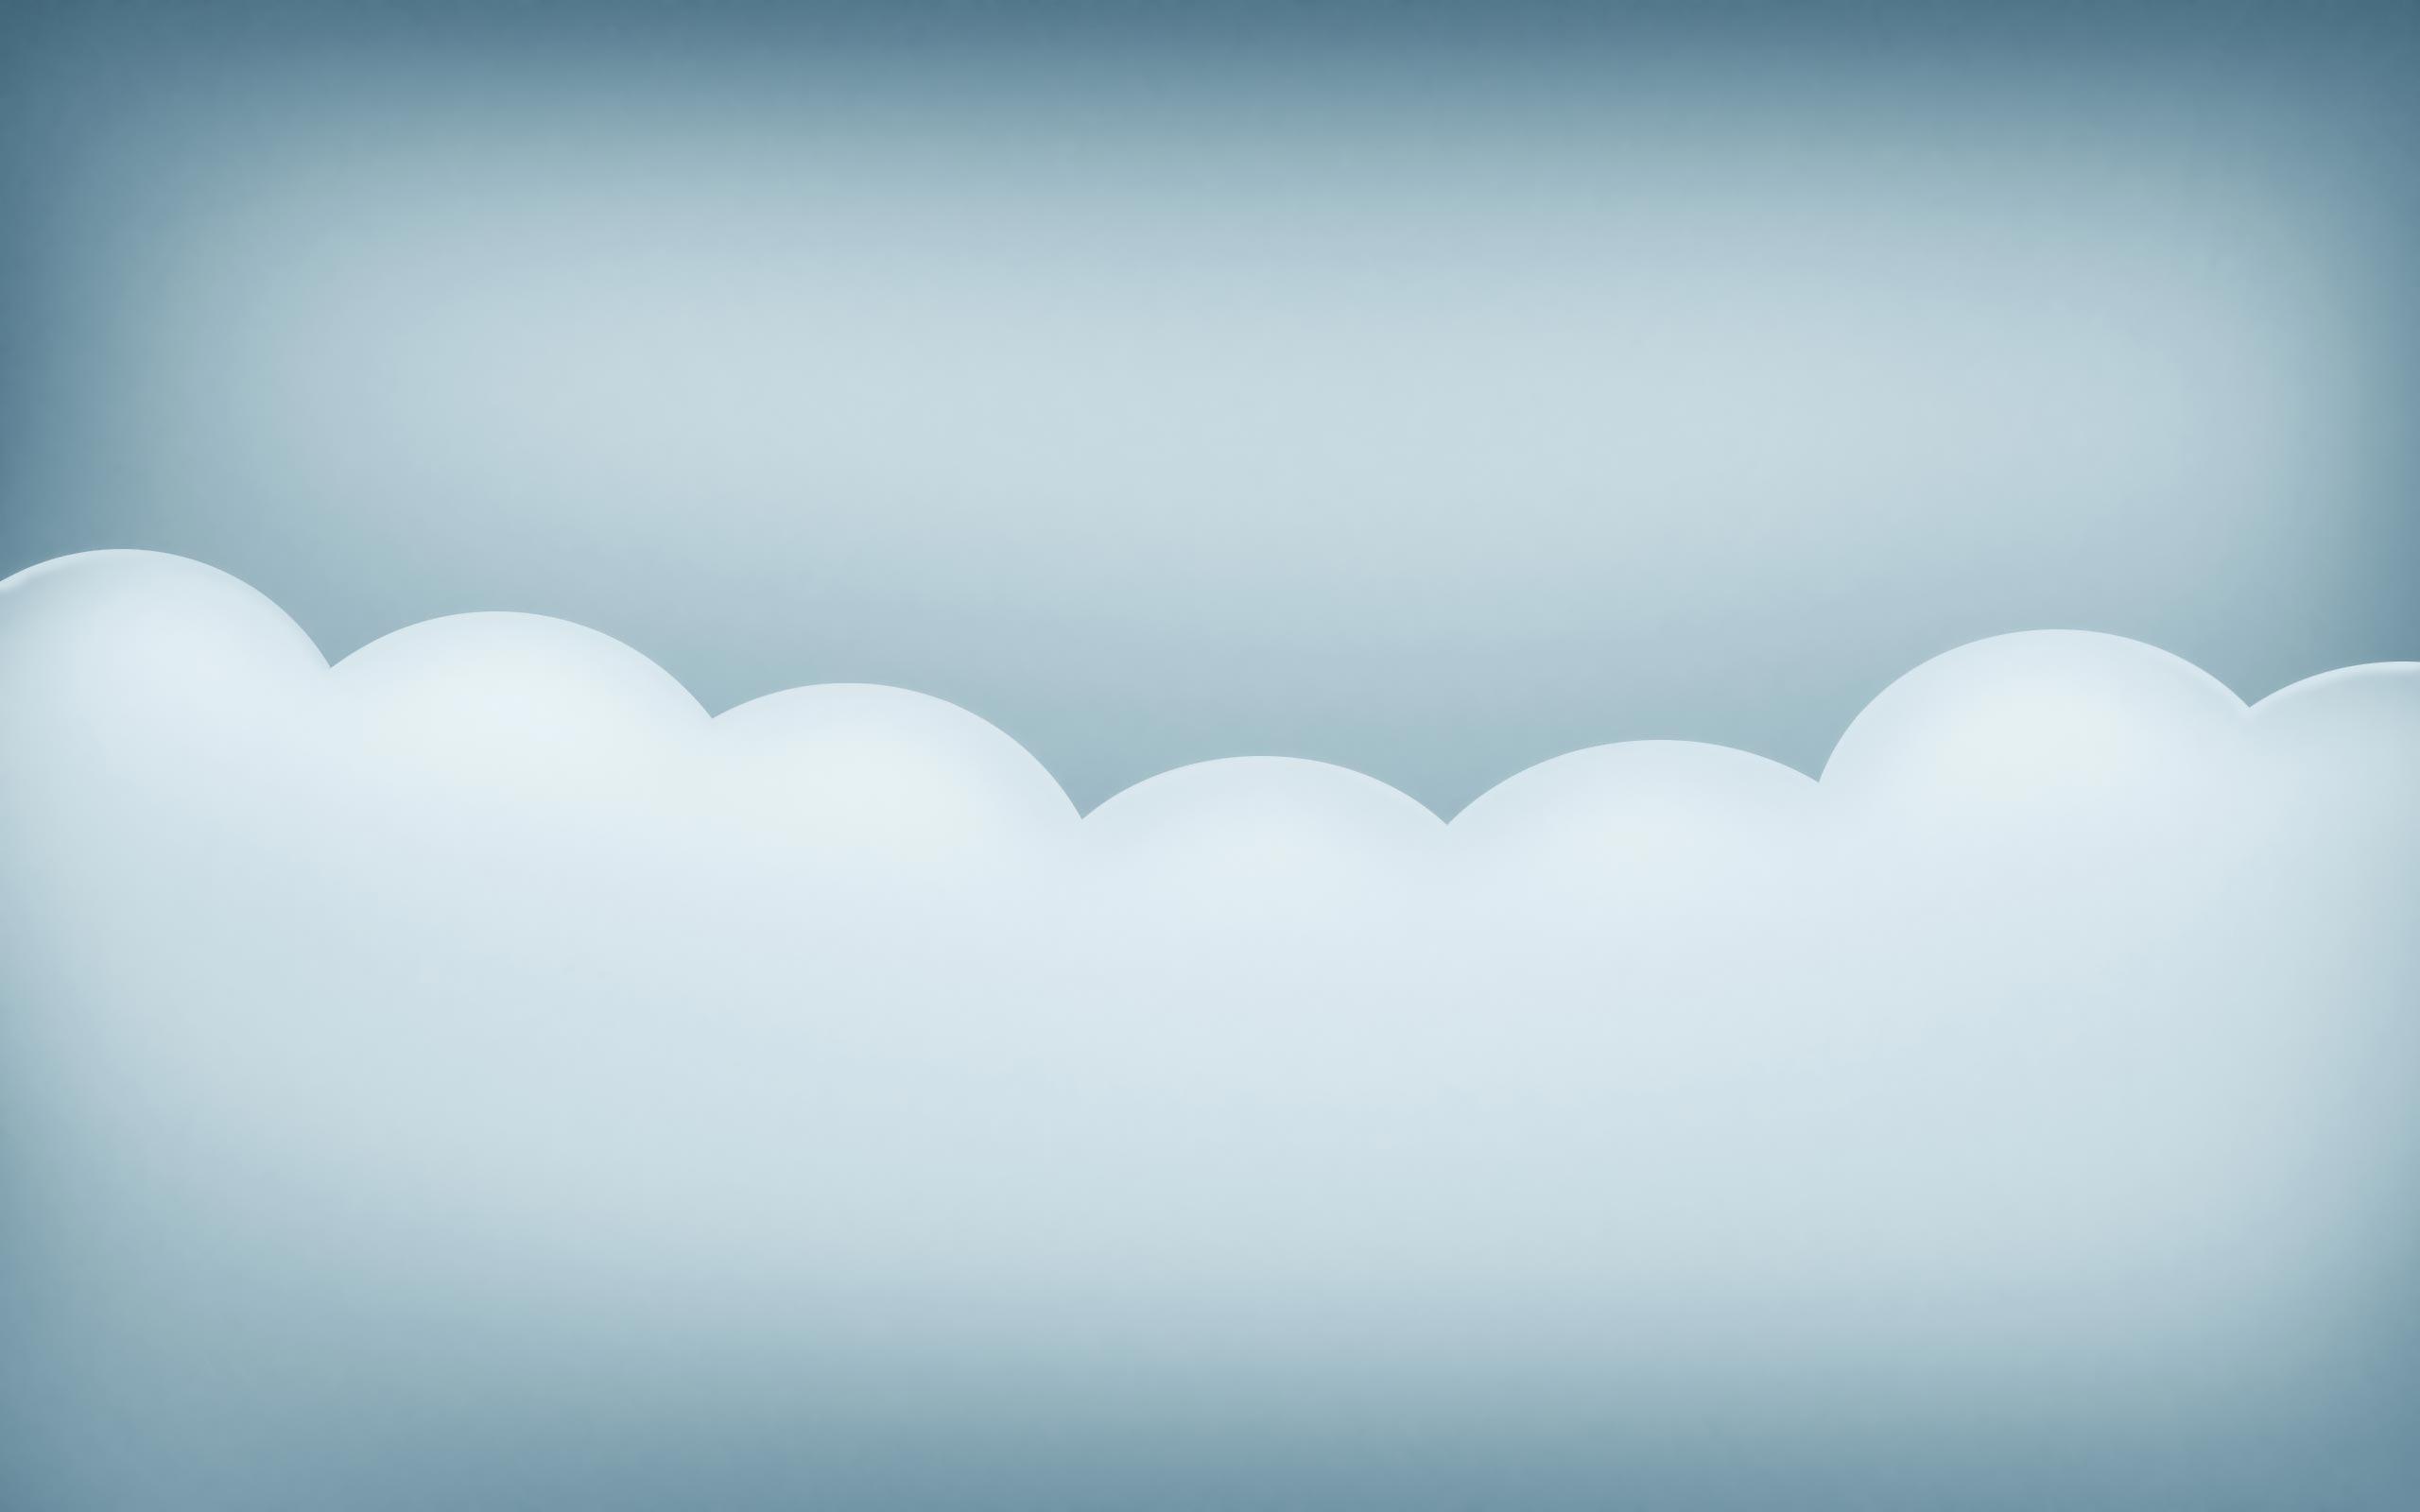 Wallpapers Backgrounds – Desktop backgrounds Computers Windows Vista Solid  cloud